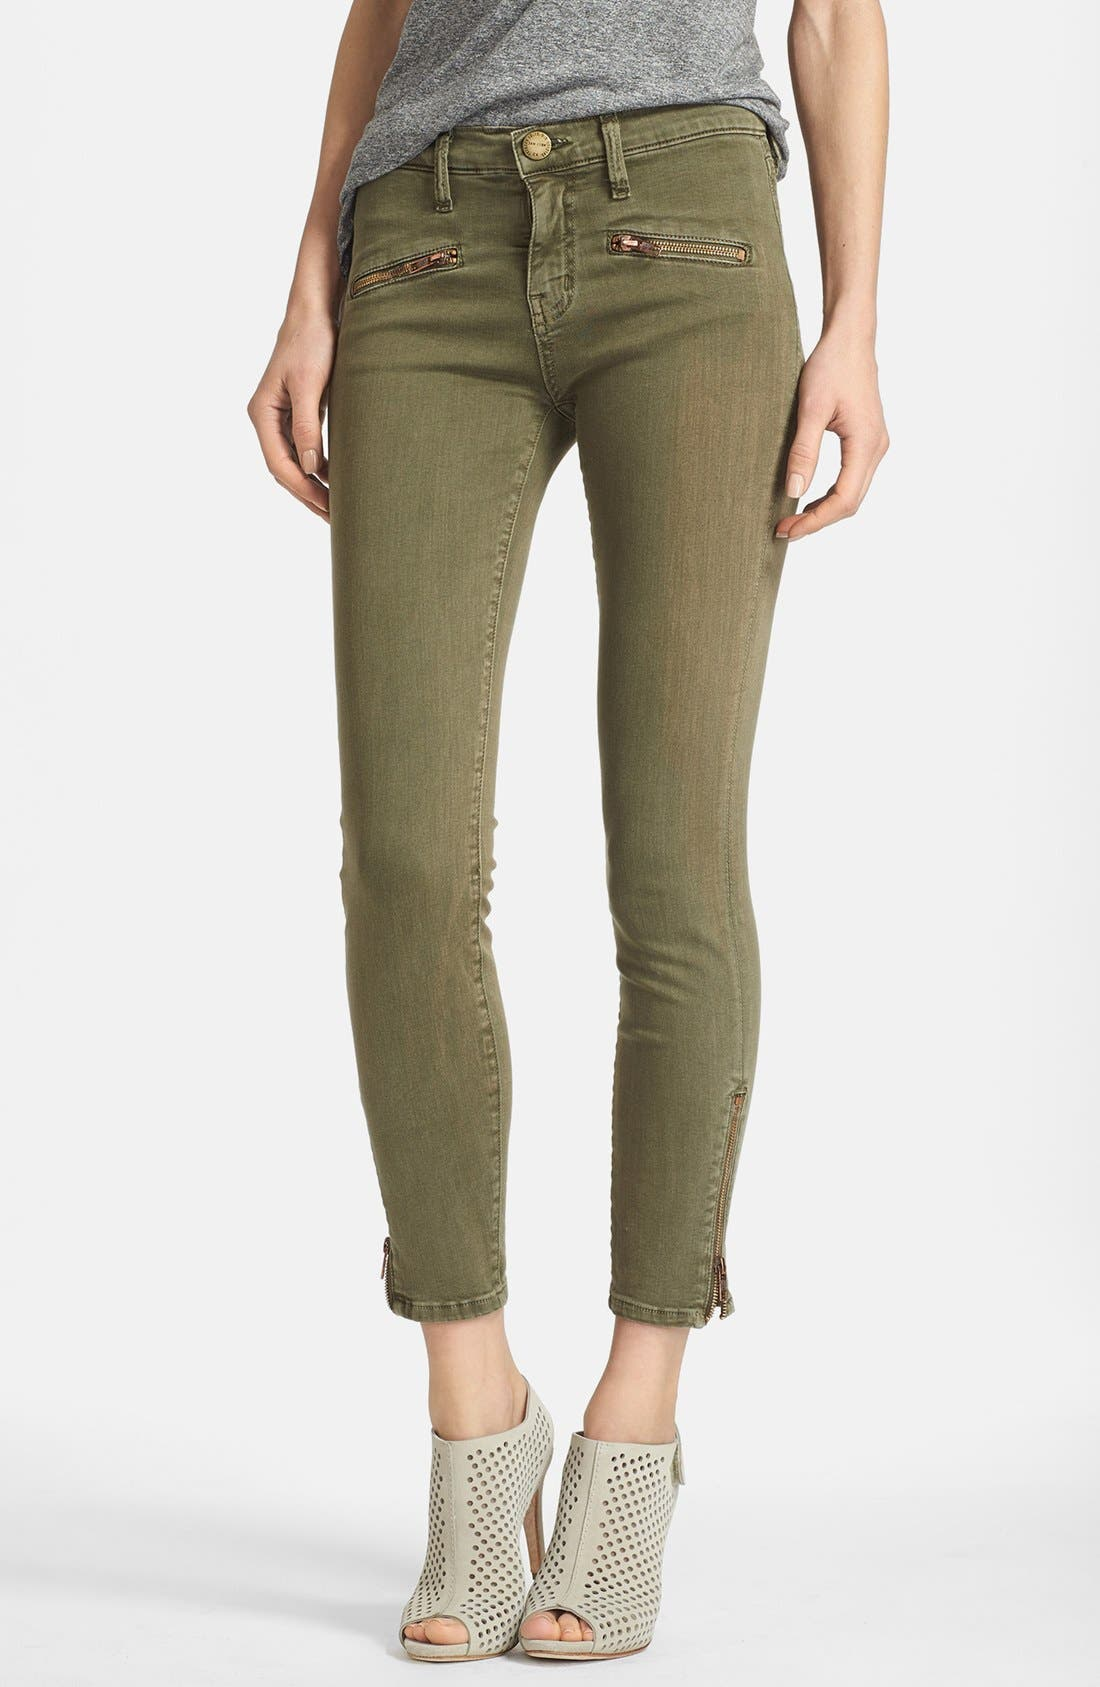 Alternate Image 1 Selected - Current/Elliott 'The Soho Zip Stiletto' Skinny Jeans (Army)